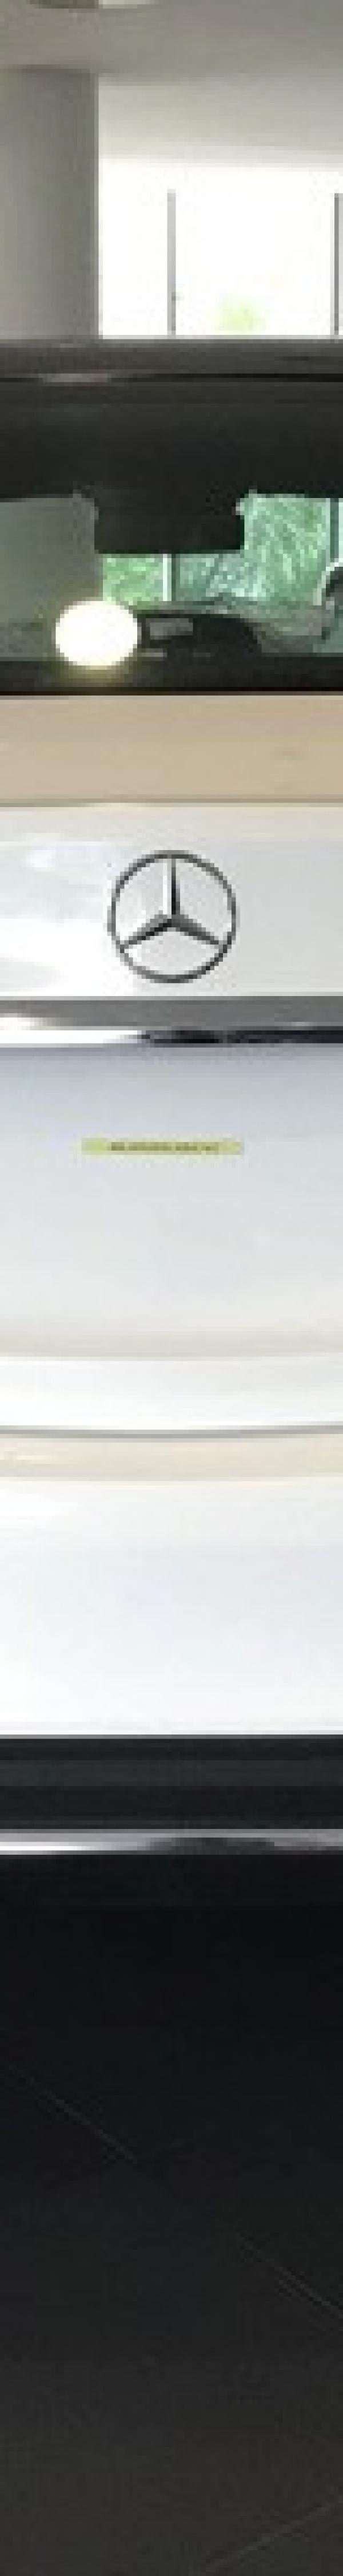 MERCEDES BENZ C 300 AMG FINAL EDITION (8)